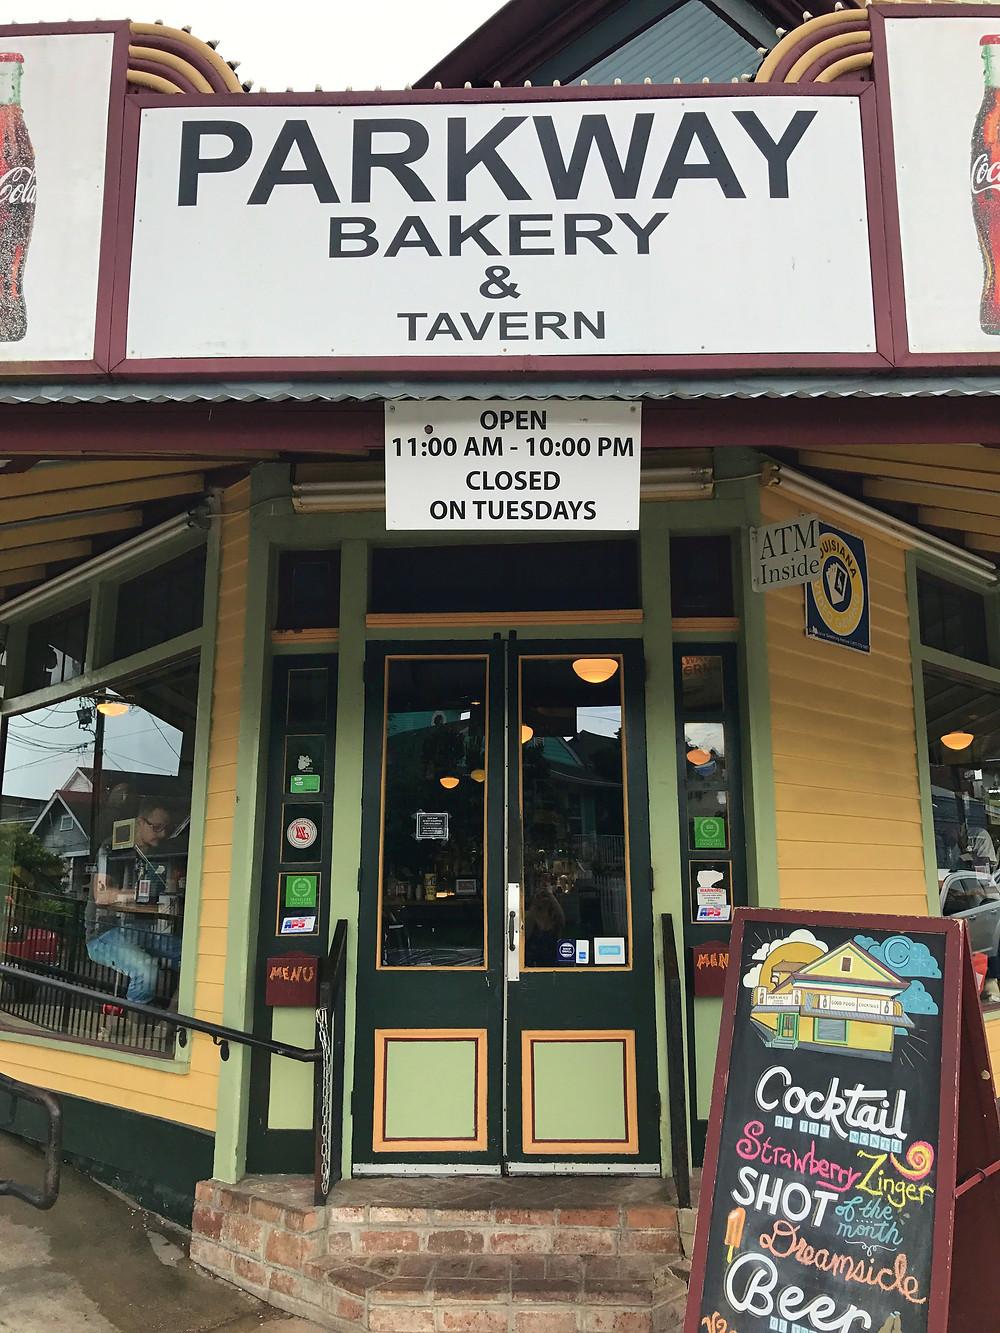 Parkway Bakery & Tavern I New Orleans Travel Guide I Nicole Riccardo